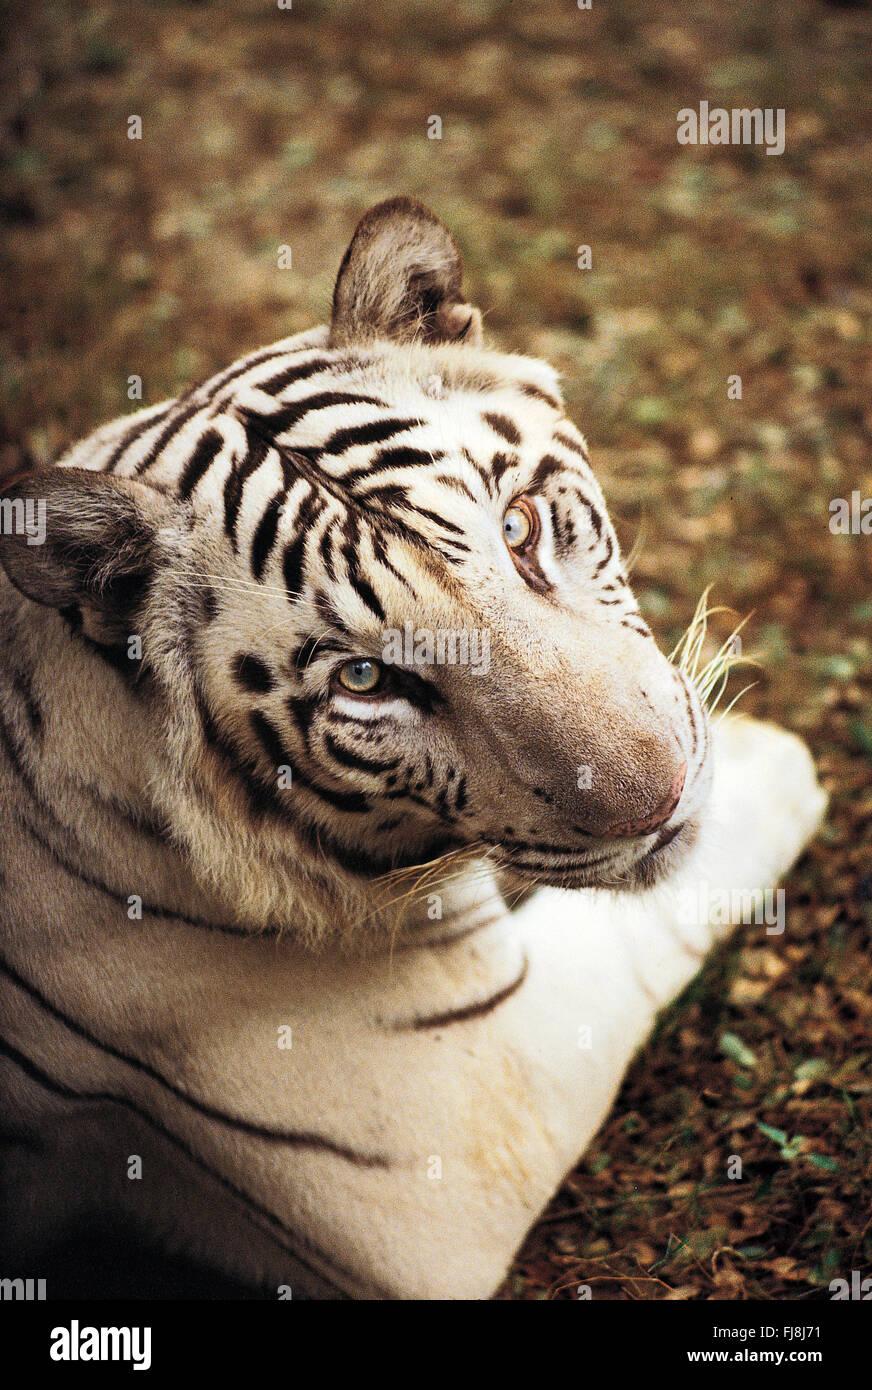 White tiger, bharatpur, rajasthan, india, asia - Stock Image